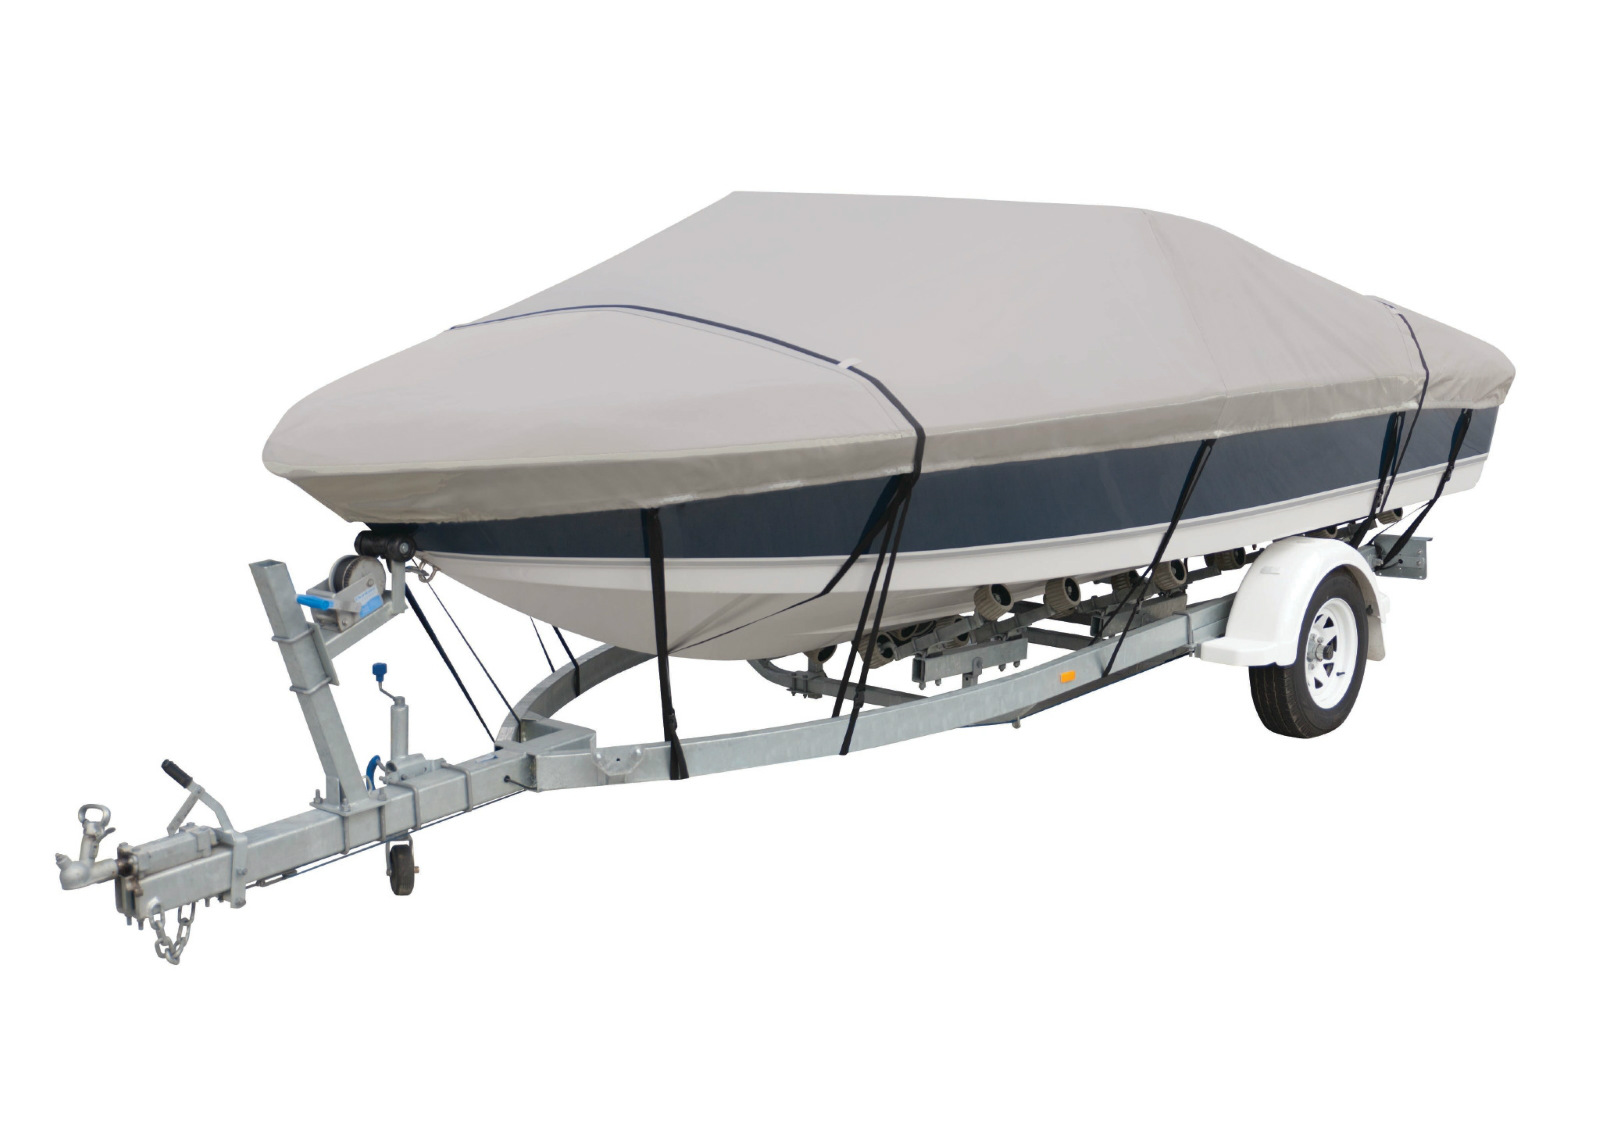 Venepeite Bowrider tyyppisille veneille 5.0-5.3 m